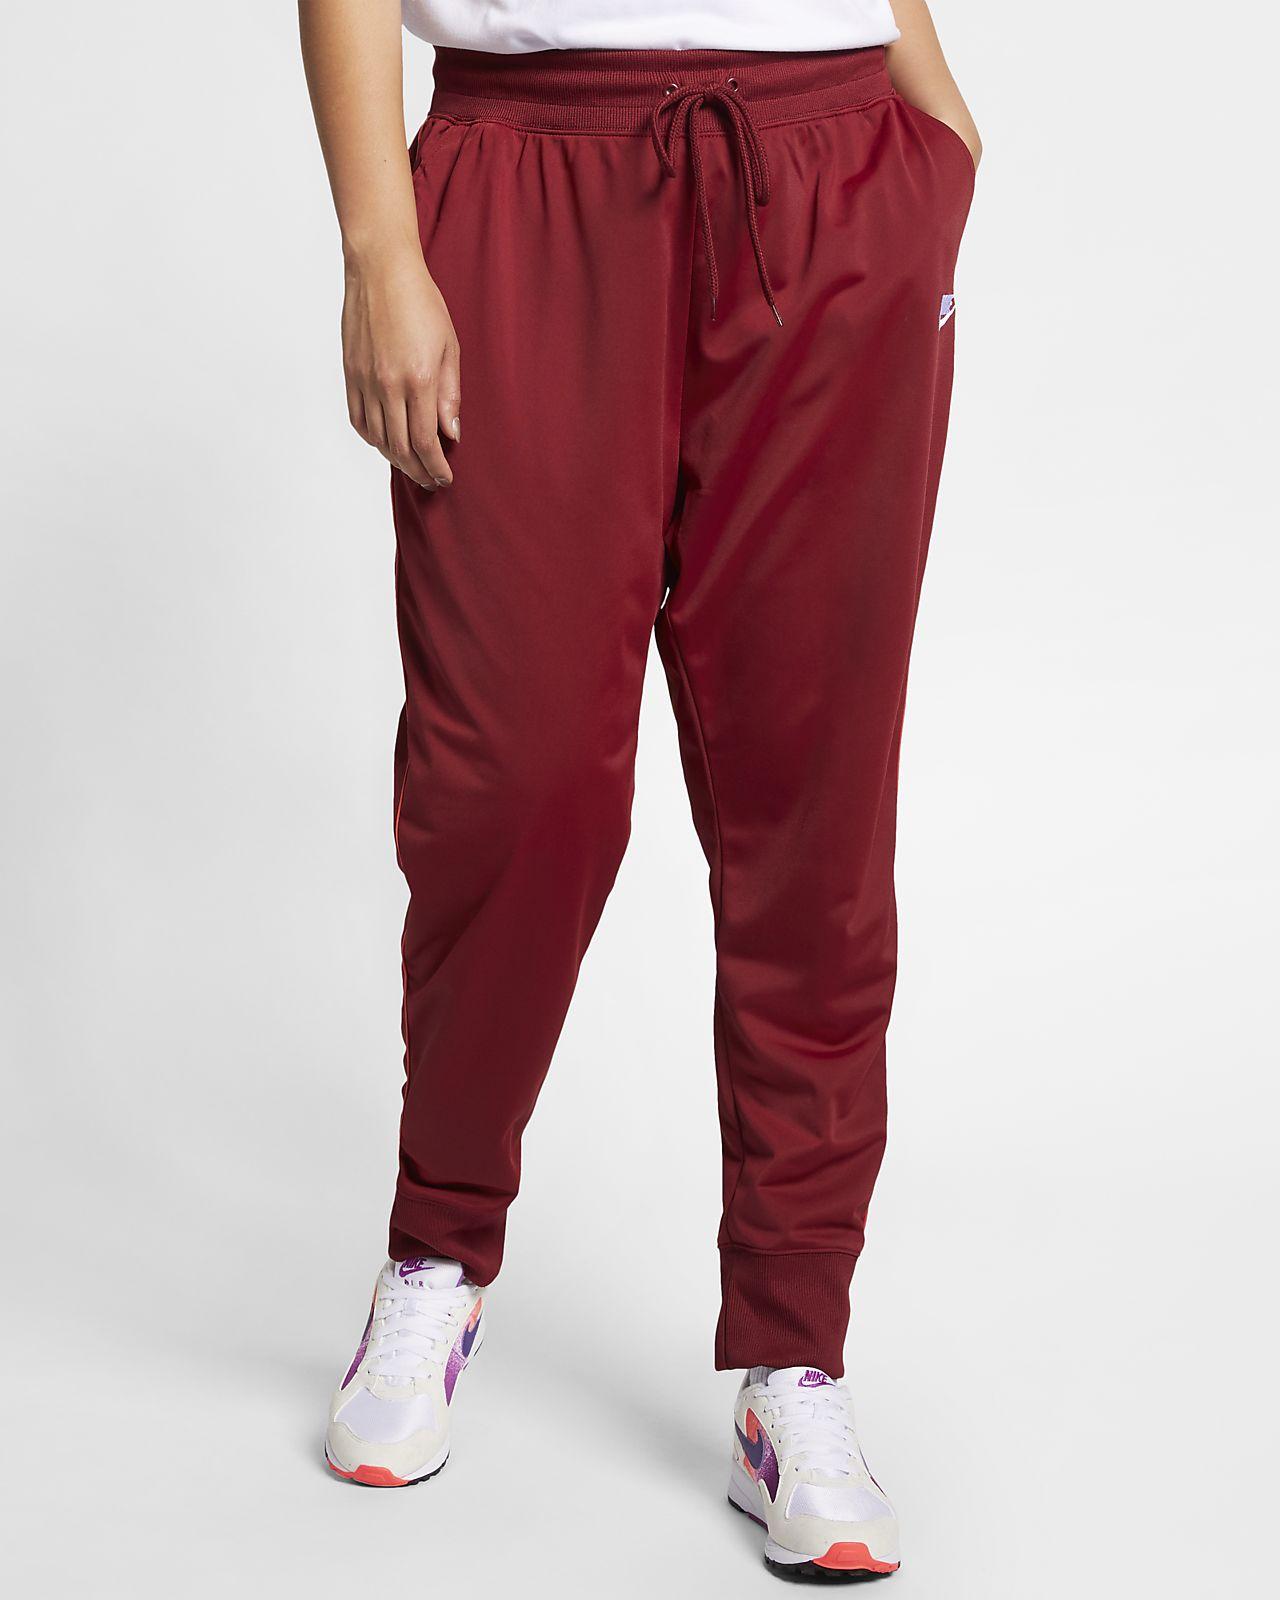 b57137d4d1f77b Nike Sportswear Heritage Damen-Jogger (große Größe). Nike.com DE